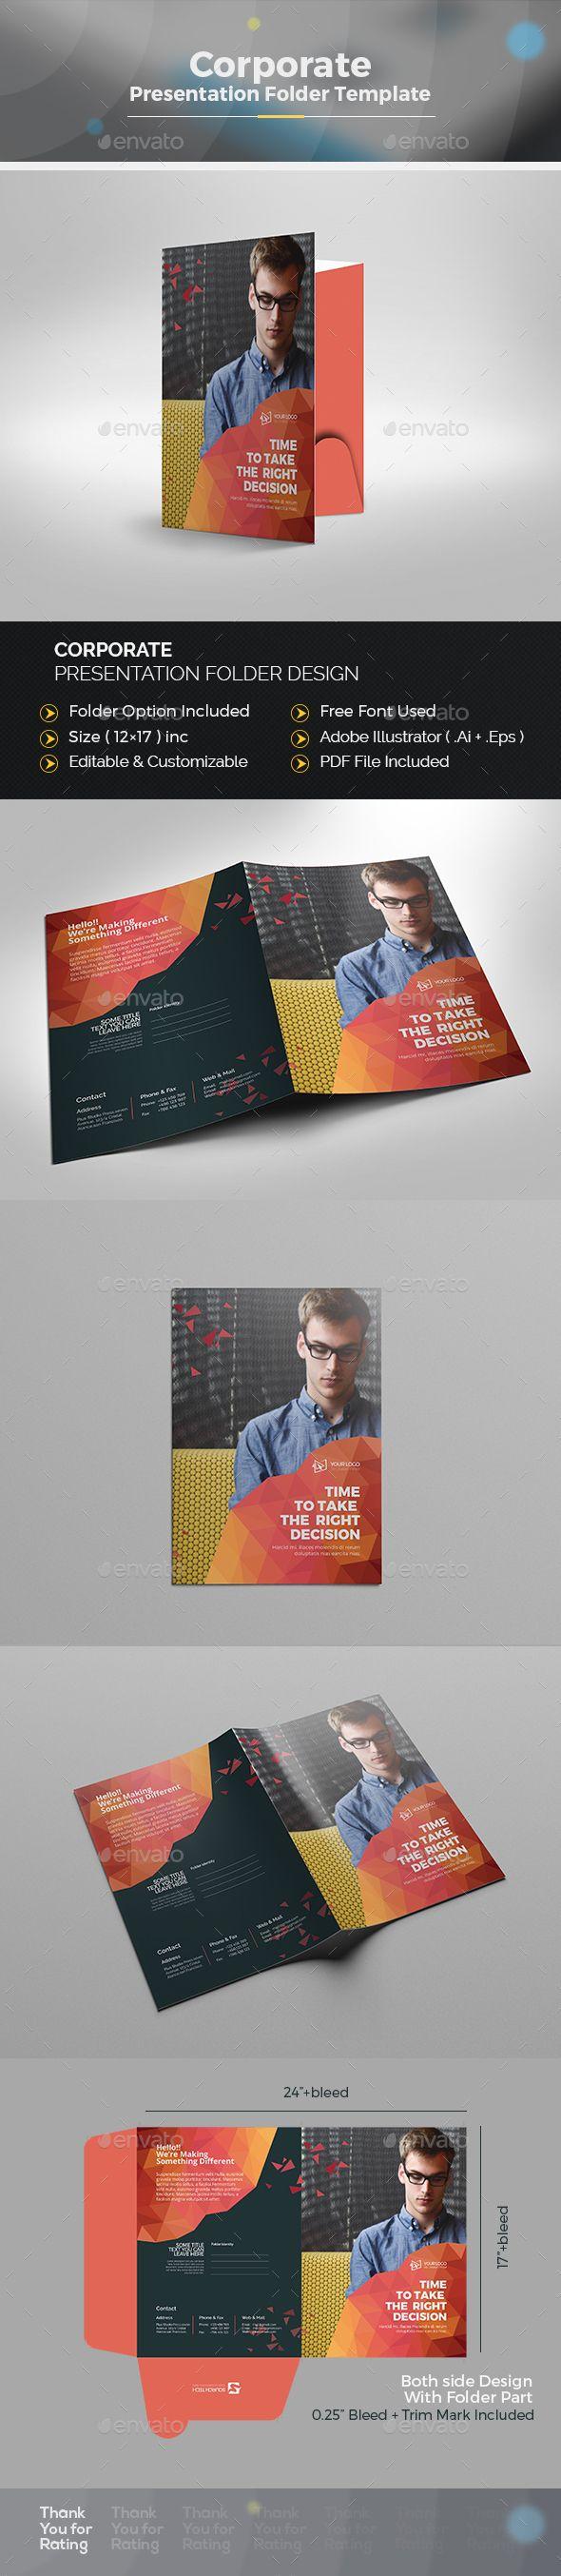 361 best folder templates images on pinterest | presentation, Presentation templates